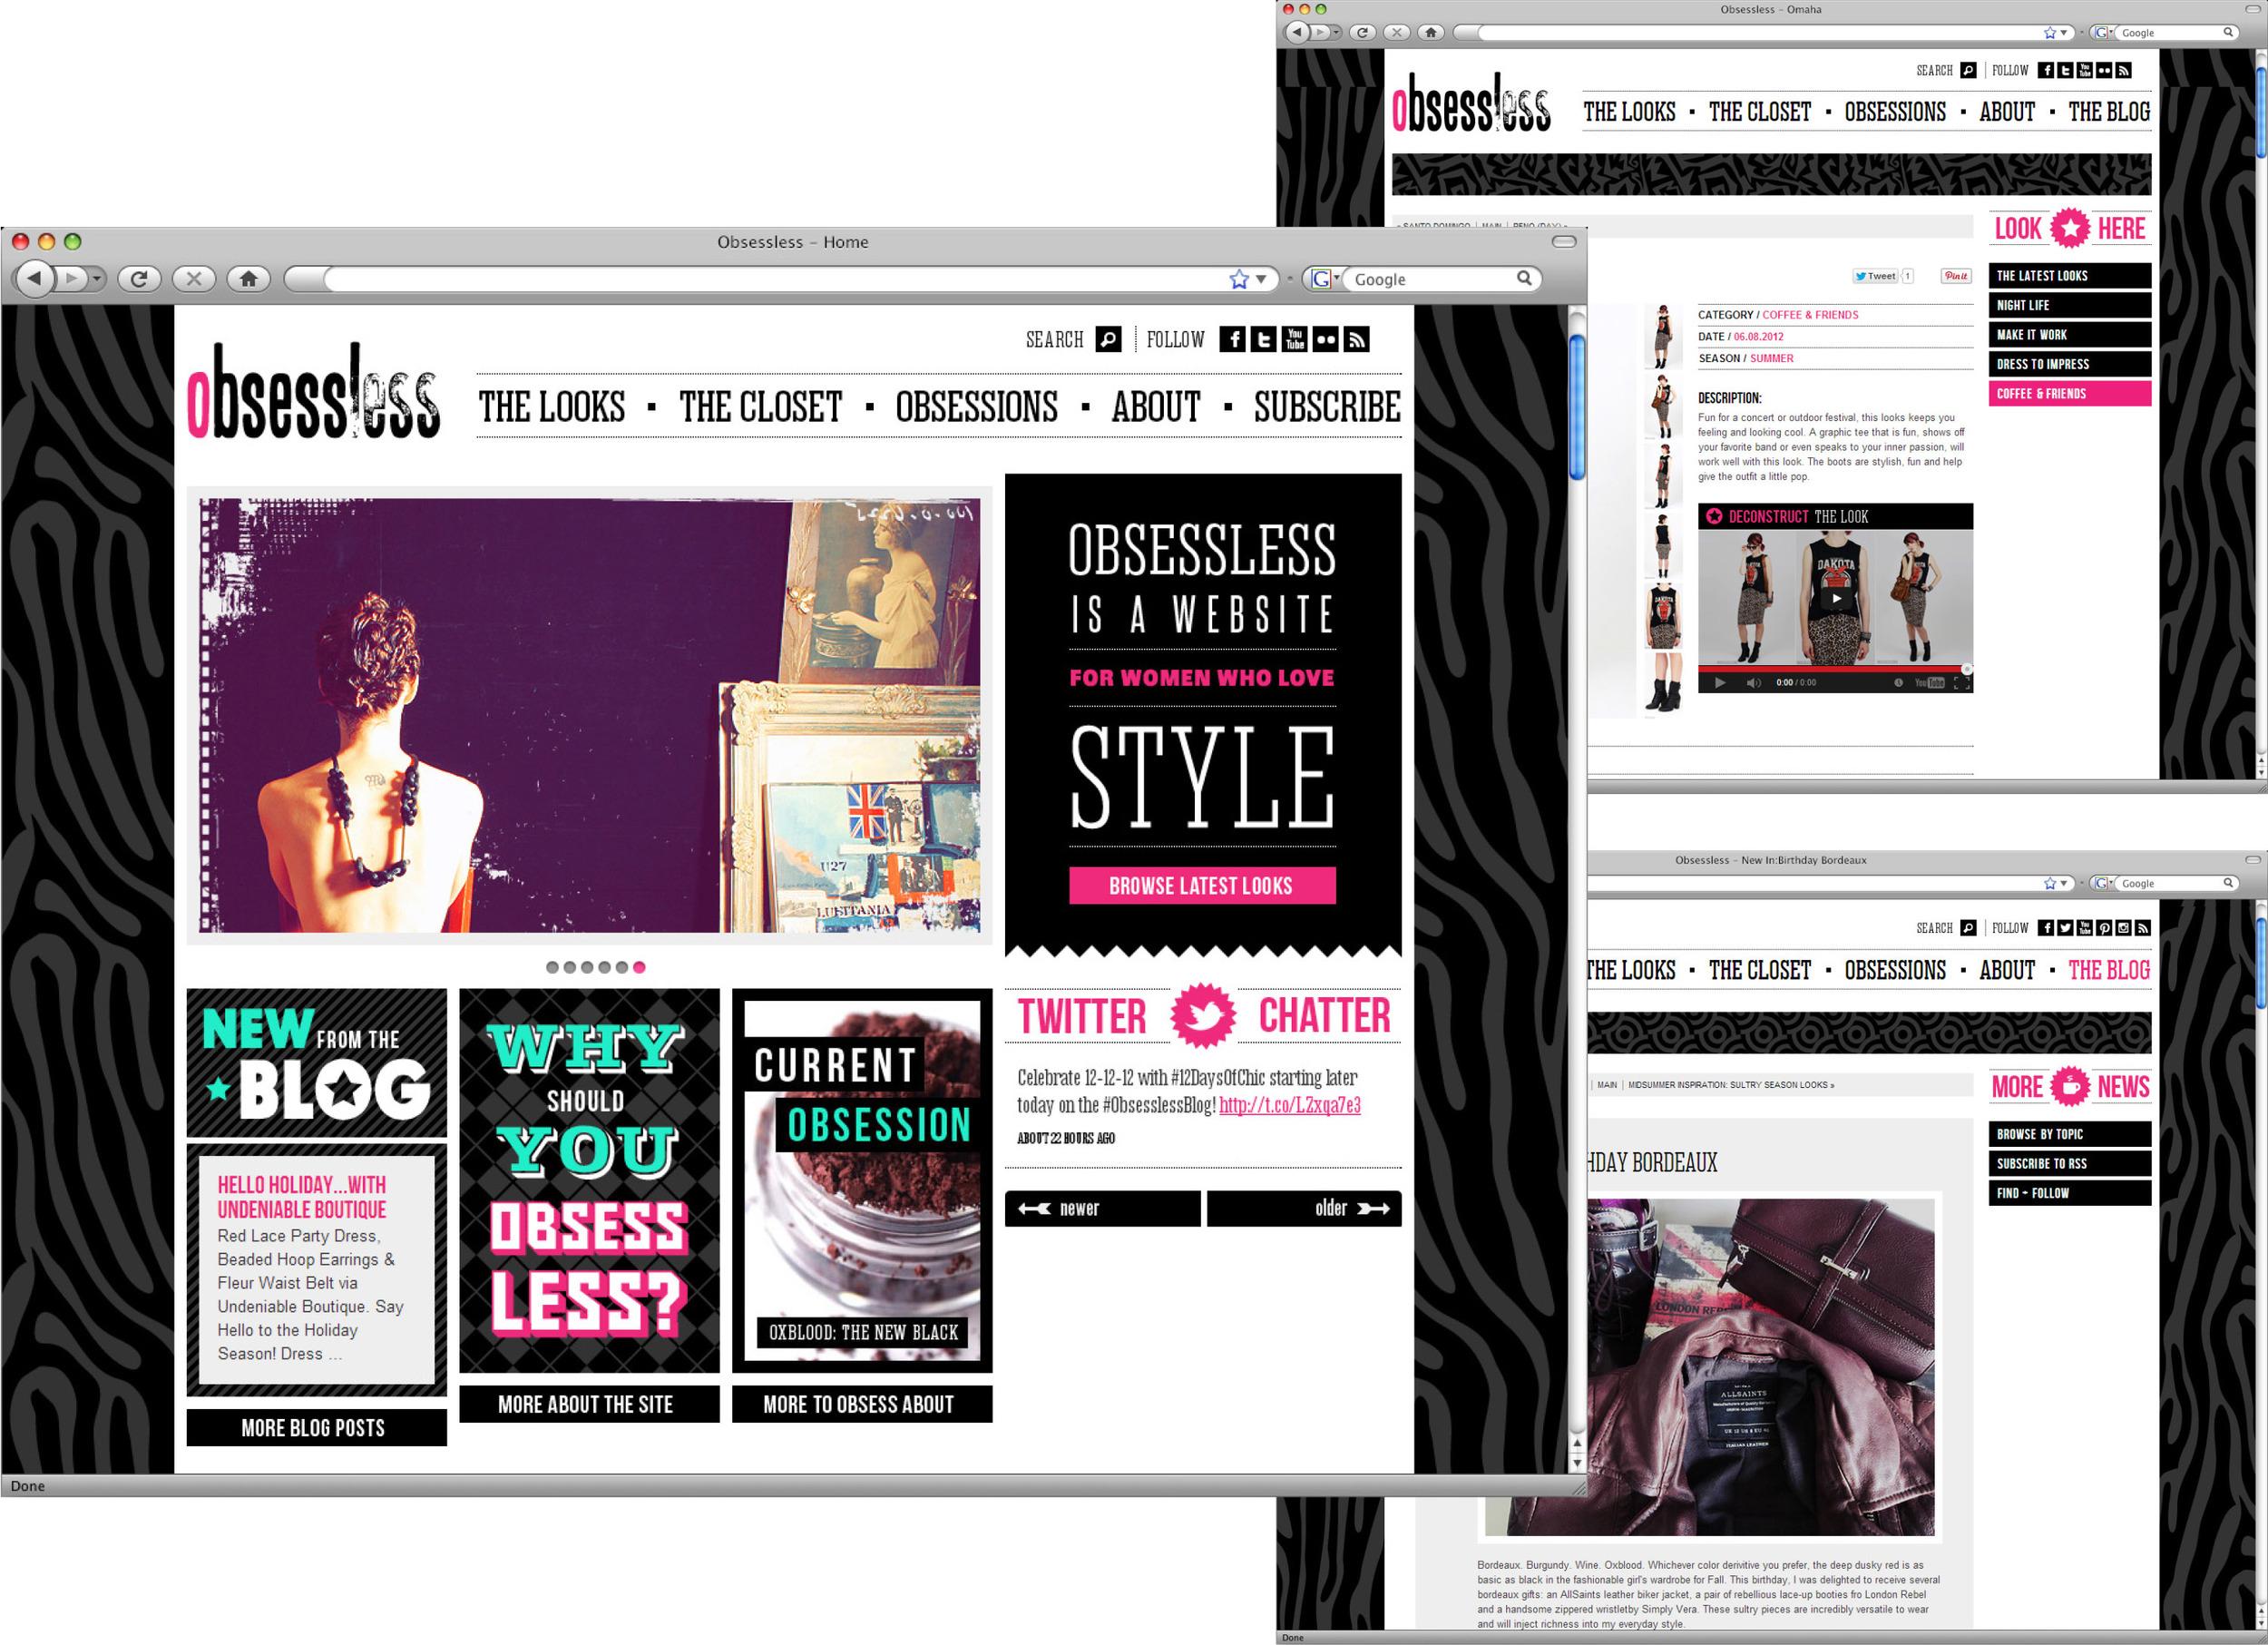 Obsessless Website, July 2014.